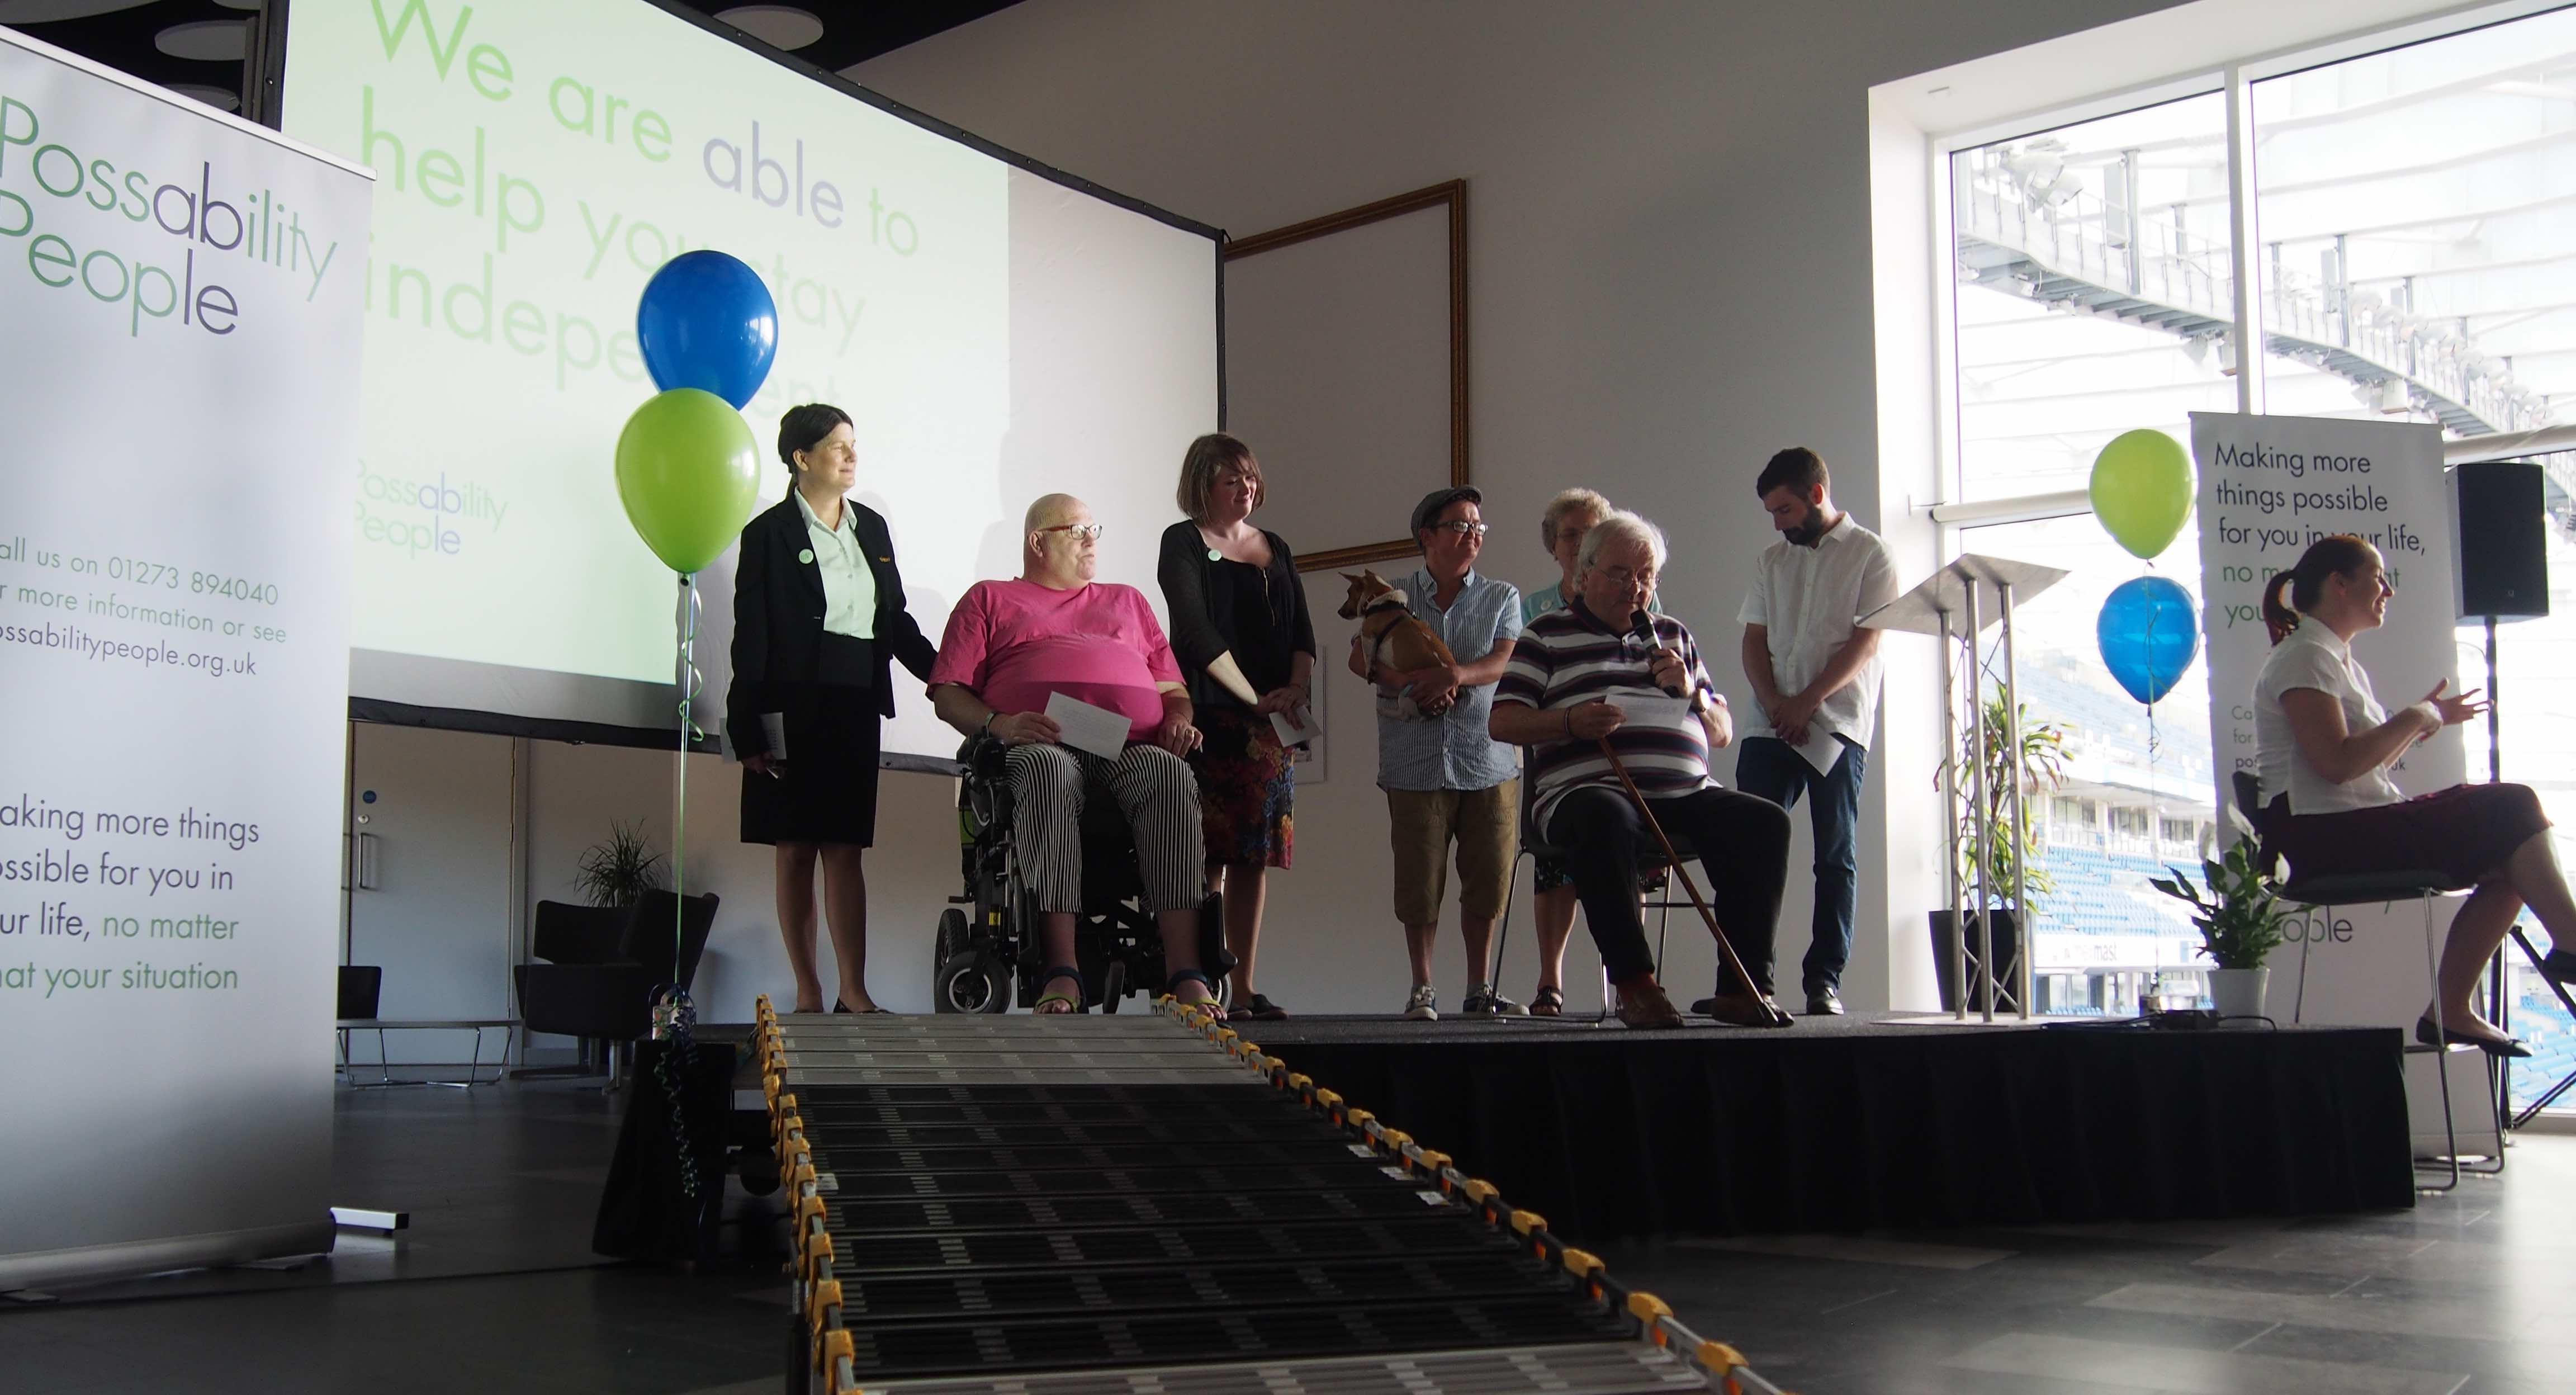 Trustees and volunteers on stage